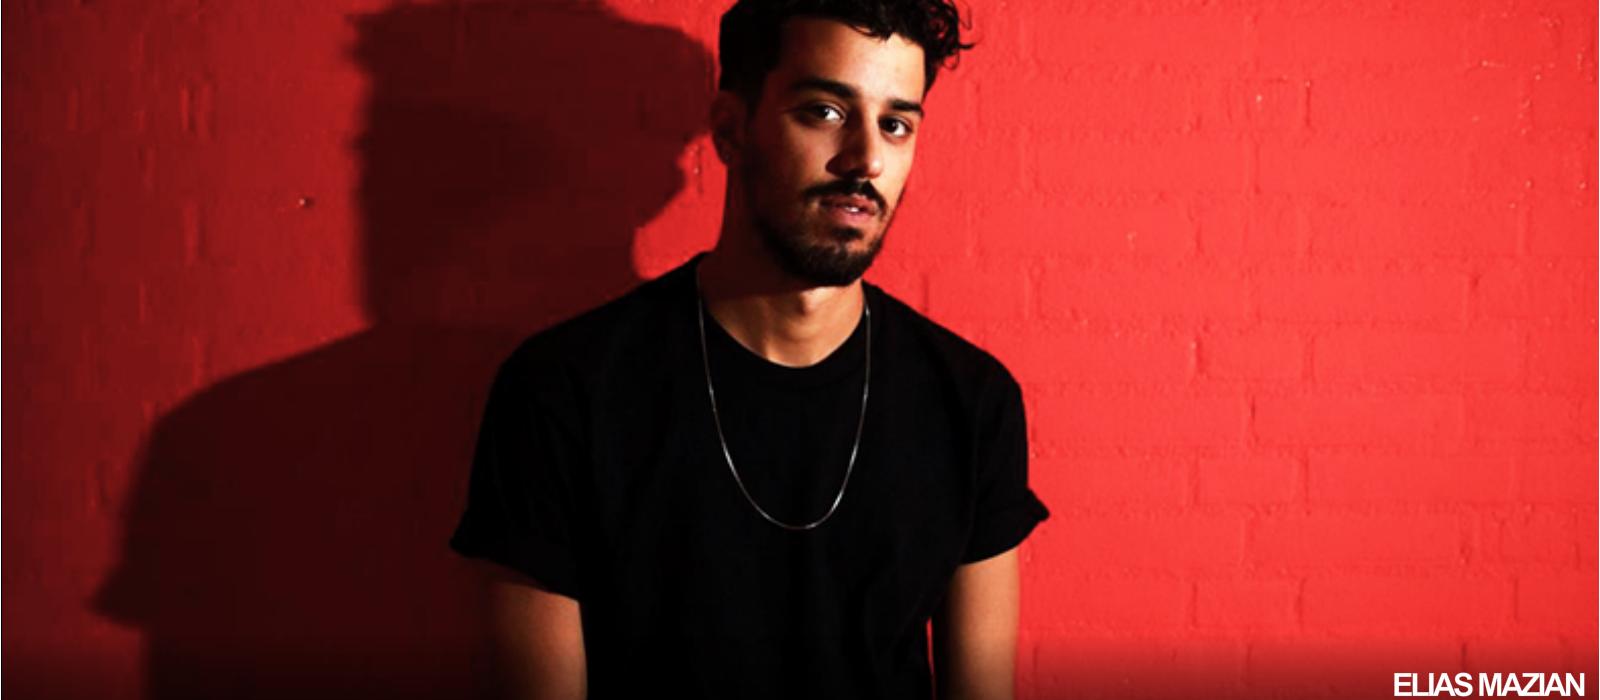 Elias Mazian (DGTL 2015 Red Bull Studios Day 1)